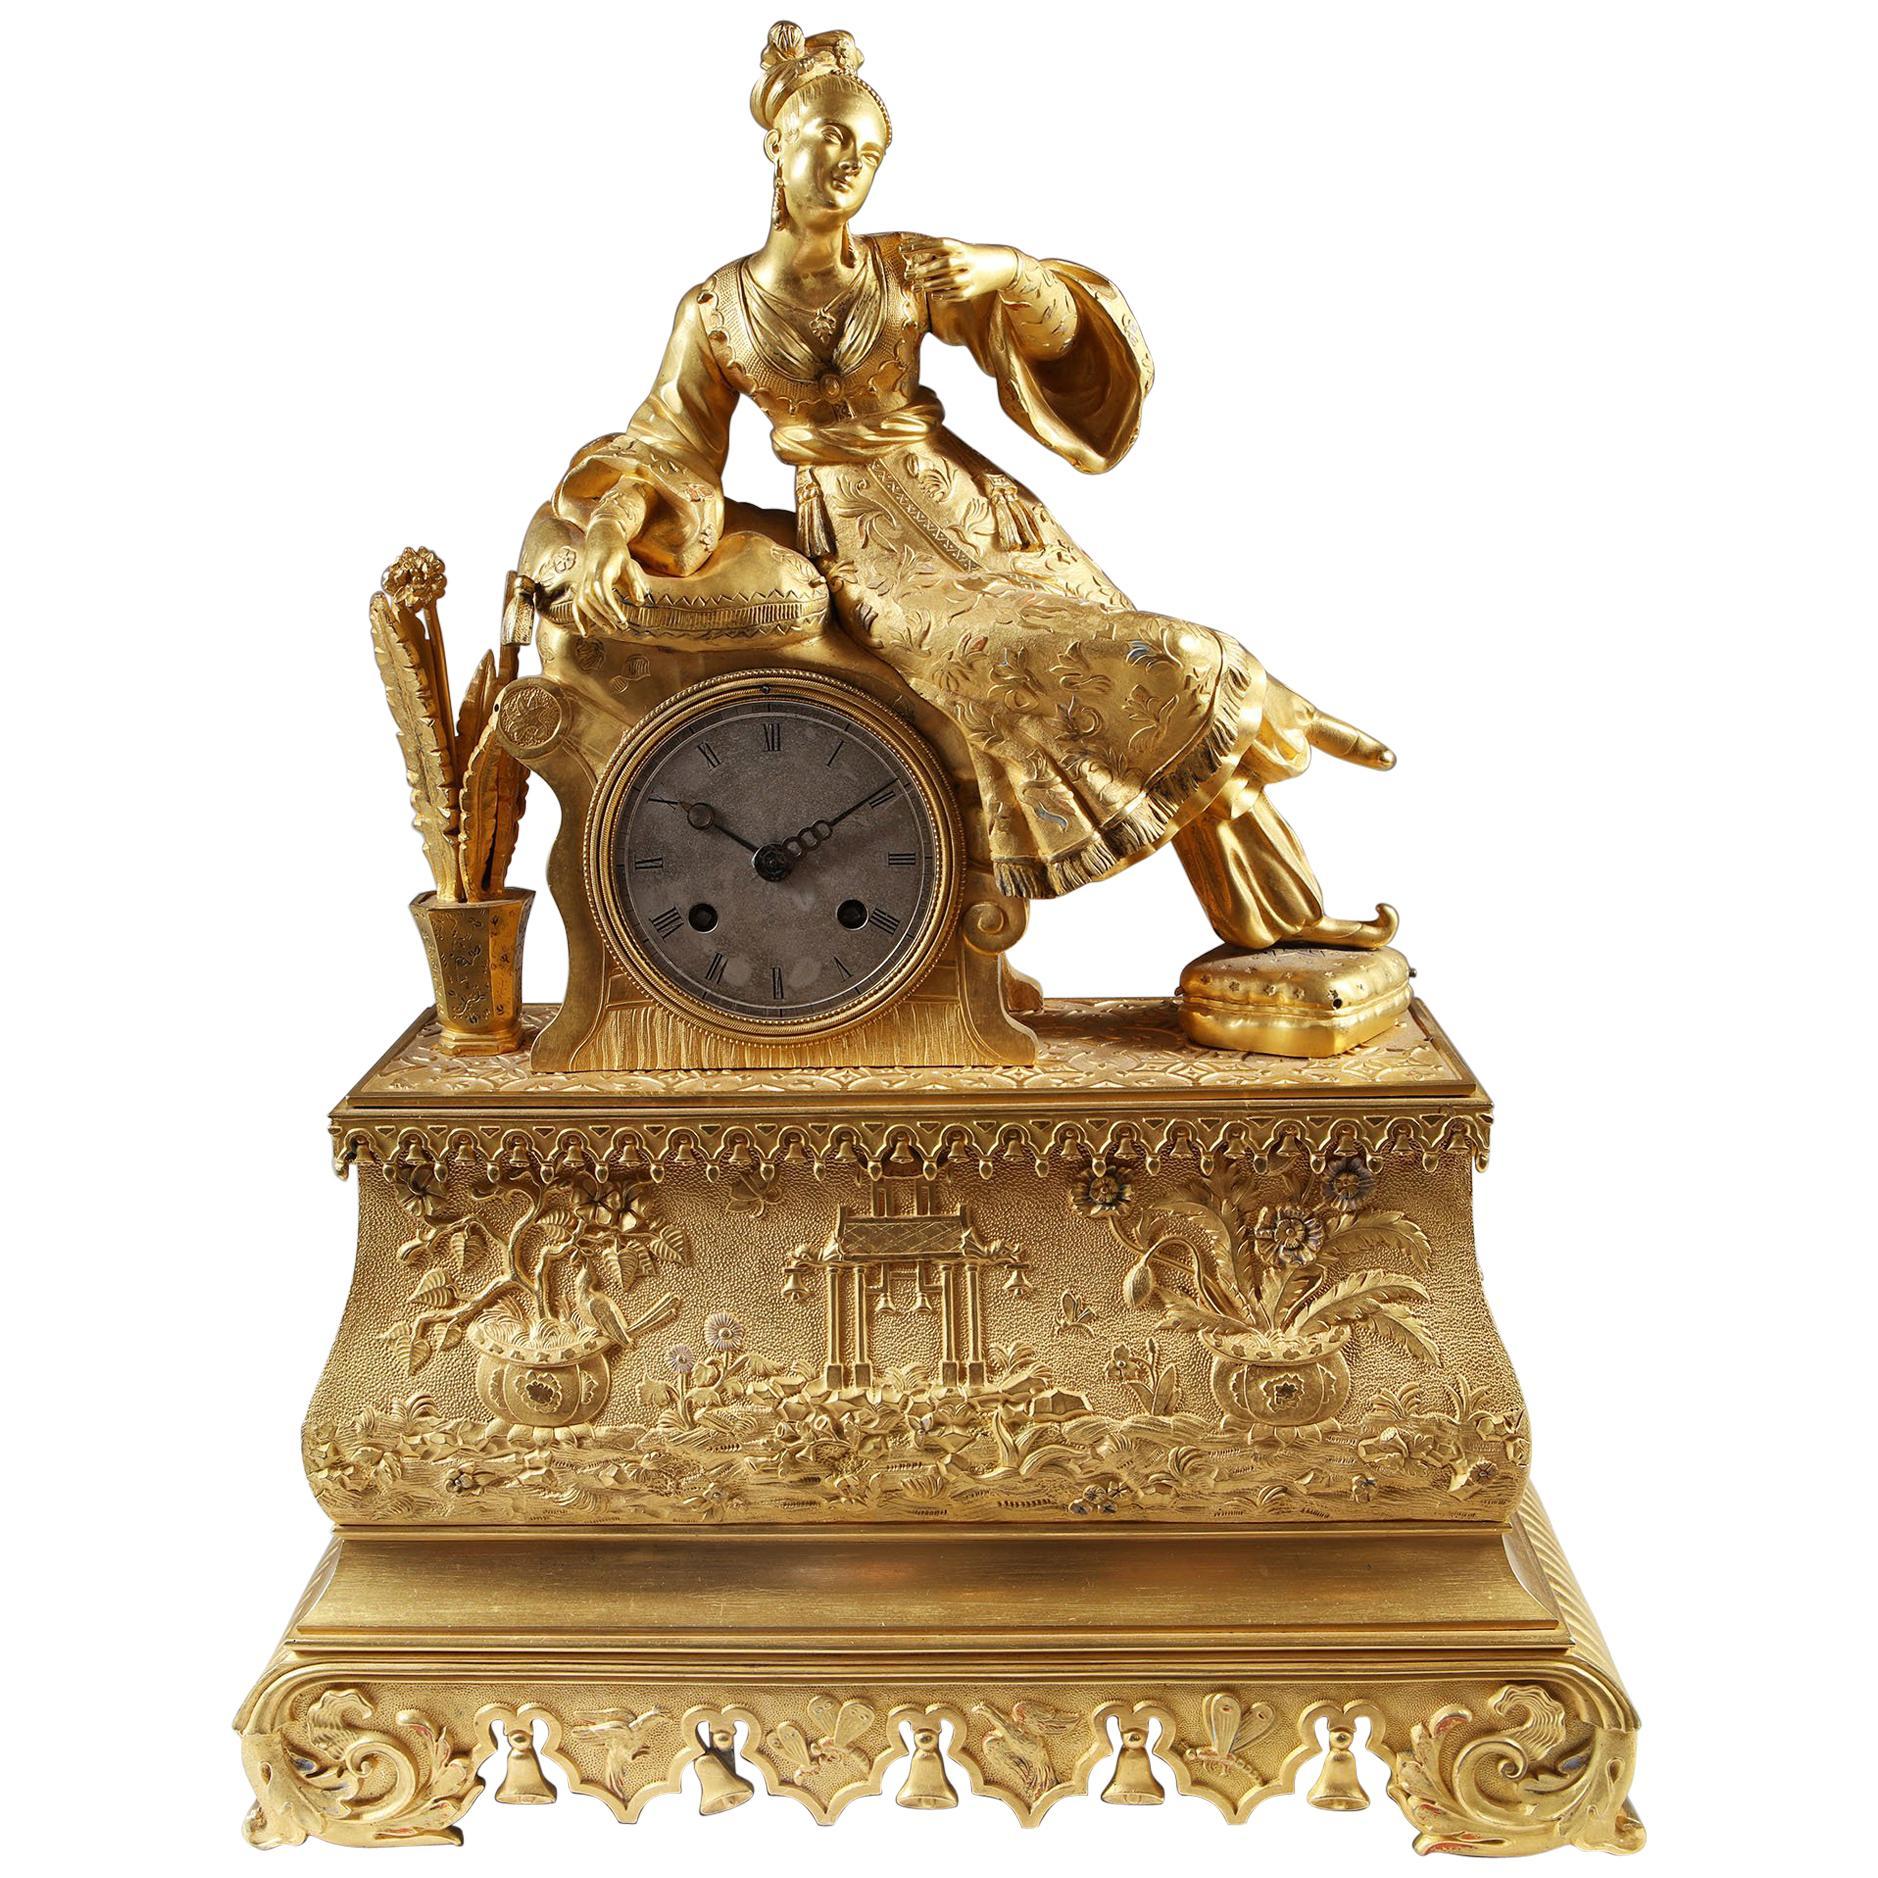 French Gilt Bronze Ottoman Chinoiserie Mantel Clock